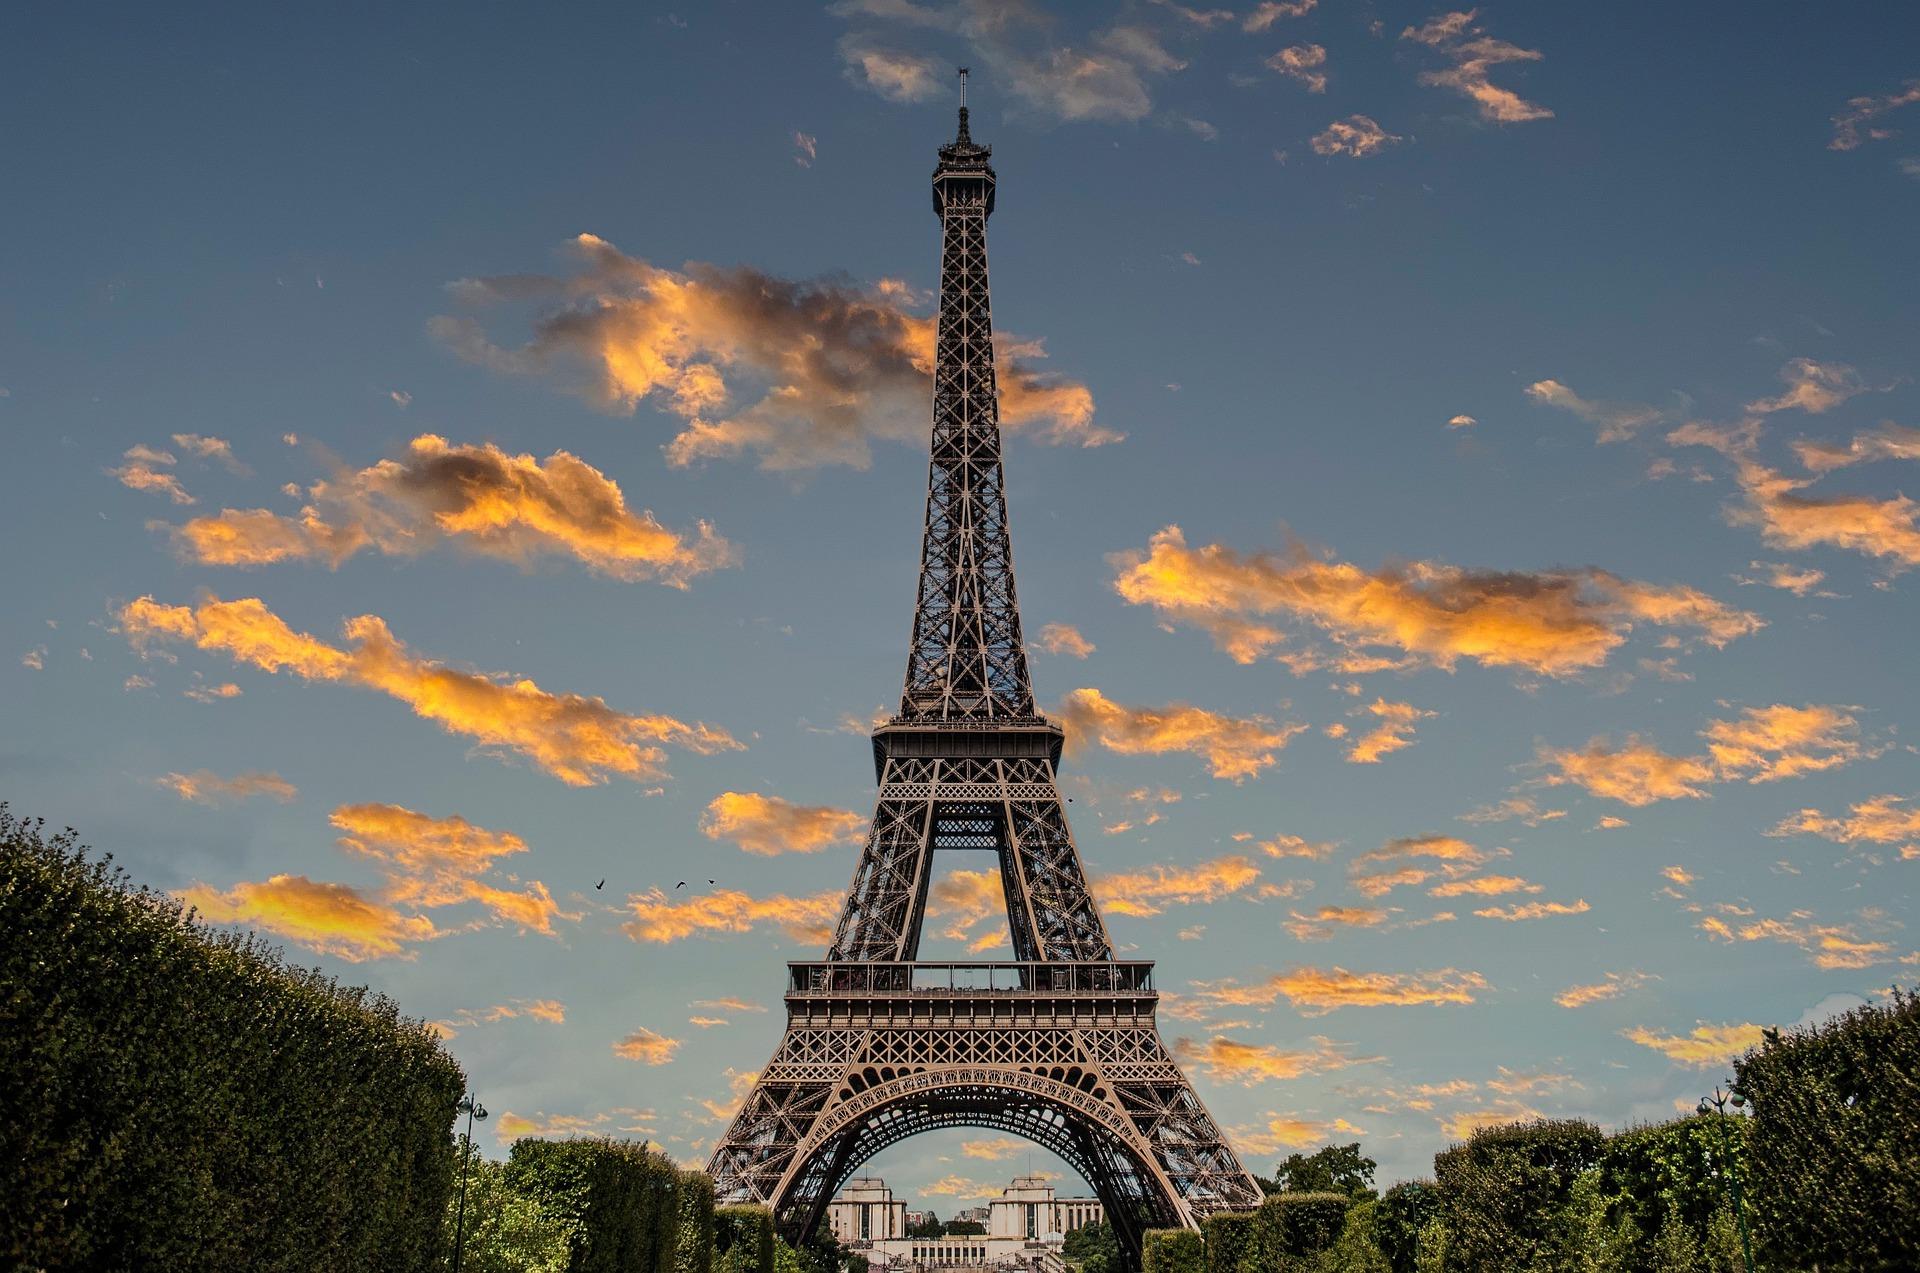 1 Day Paris Itinerary